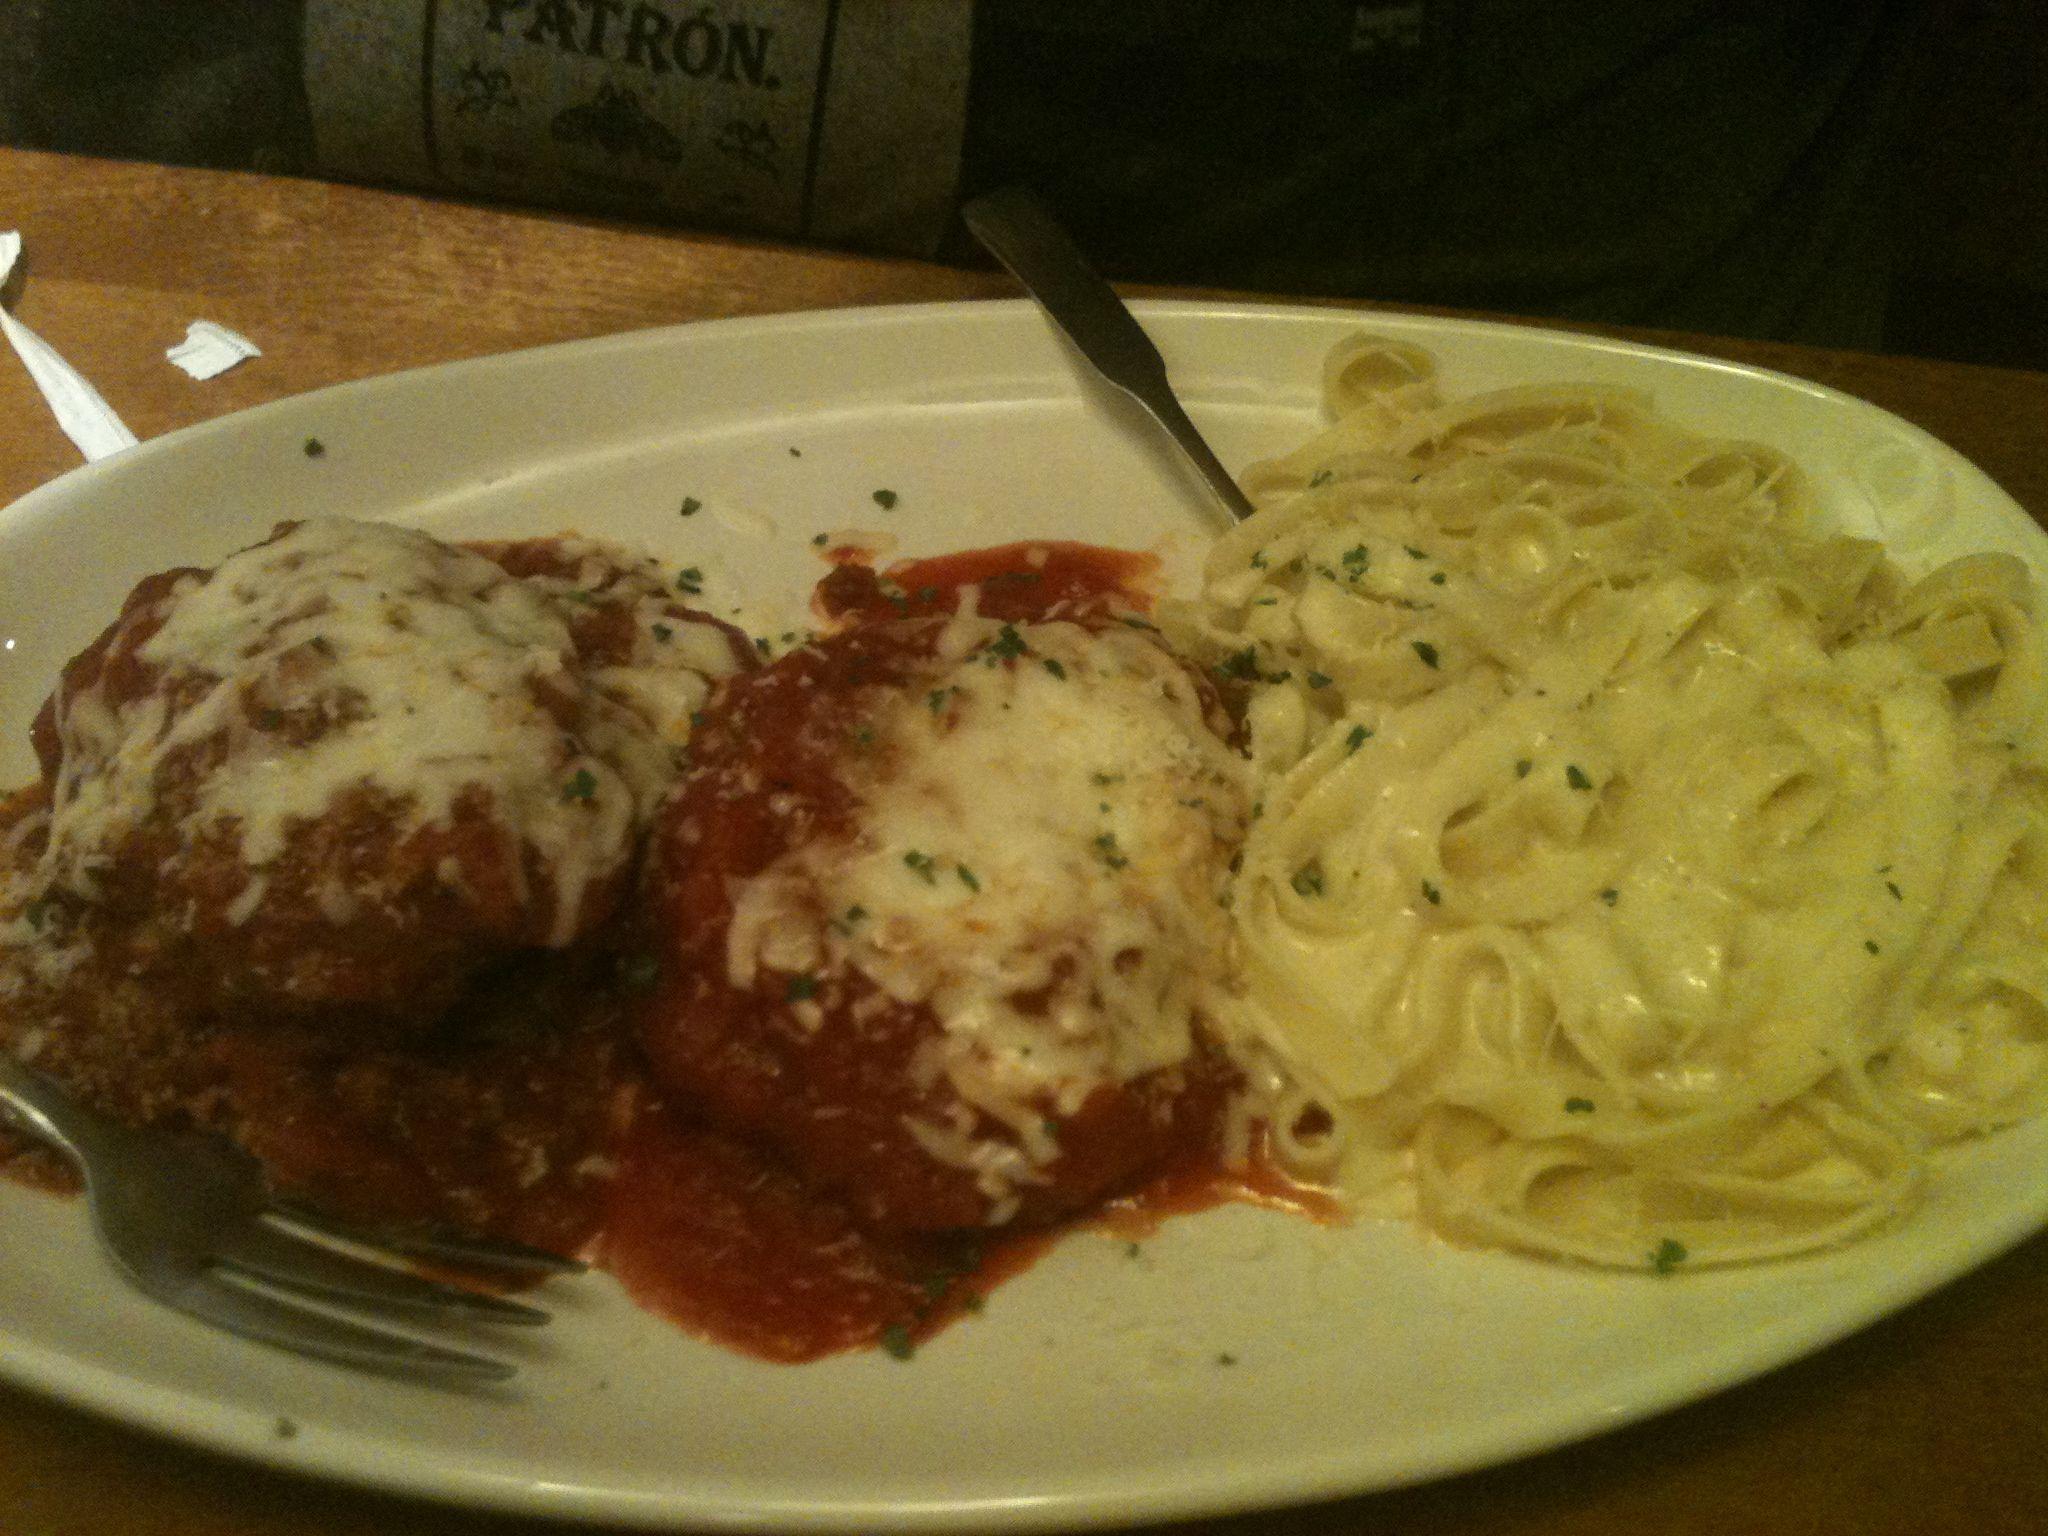 Tour of Italy - Olive Garden Lasagna, Chicken Parmesan, Fettuccine ...